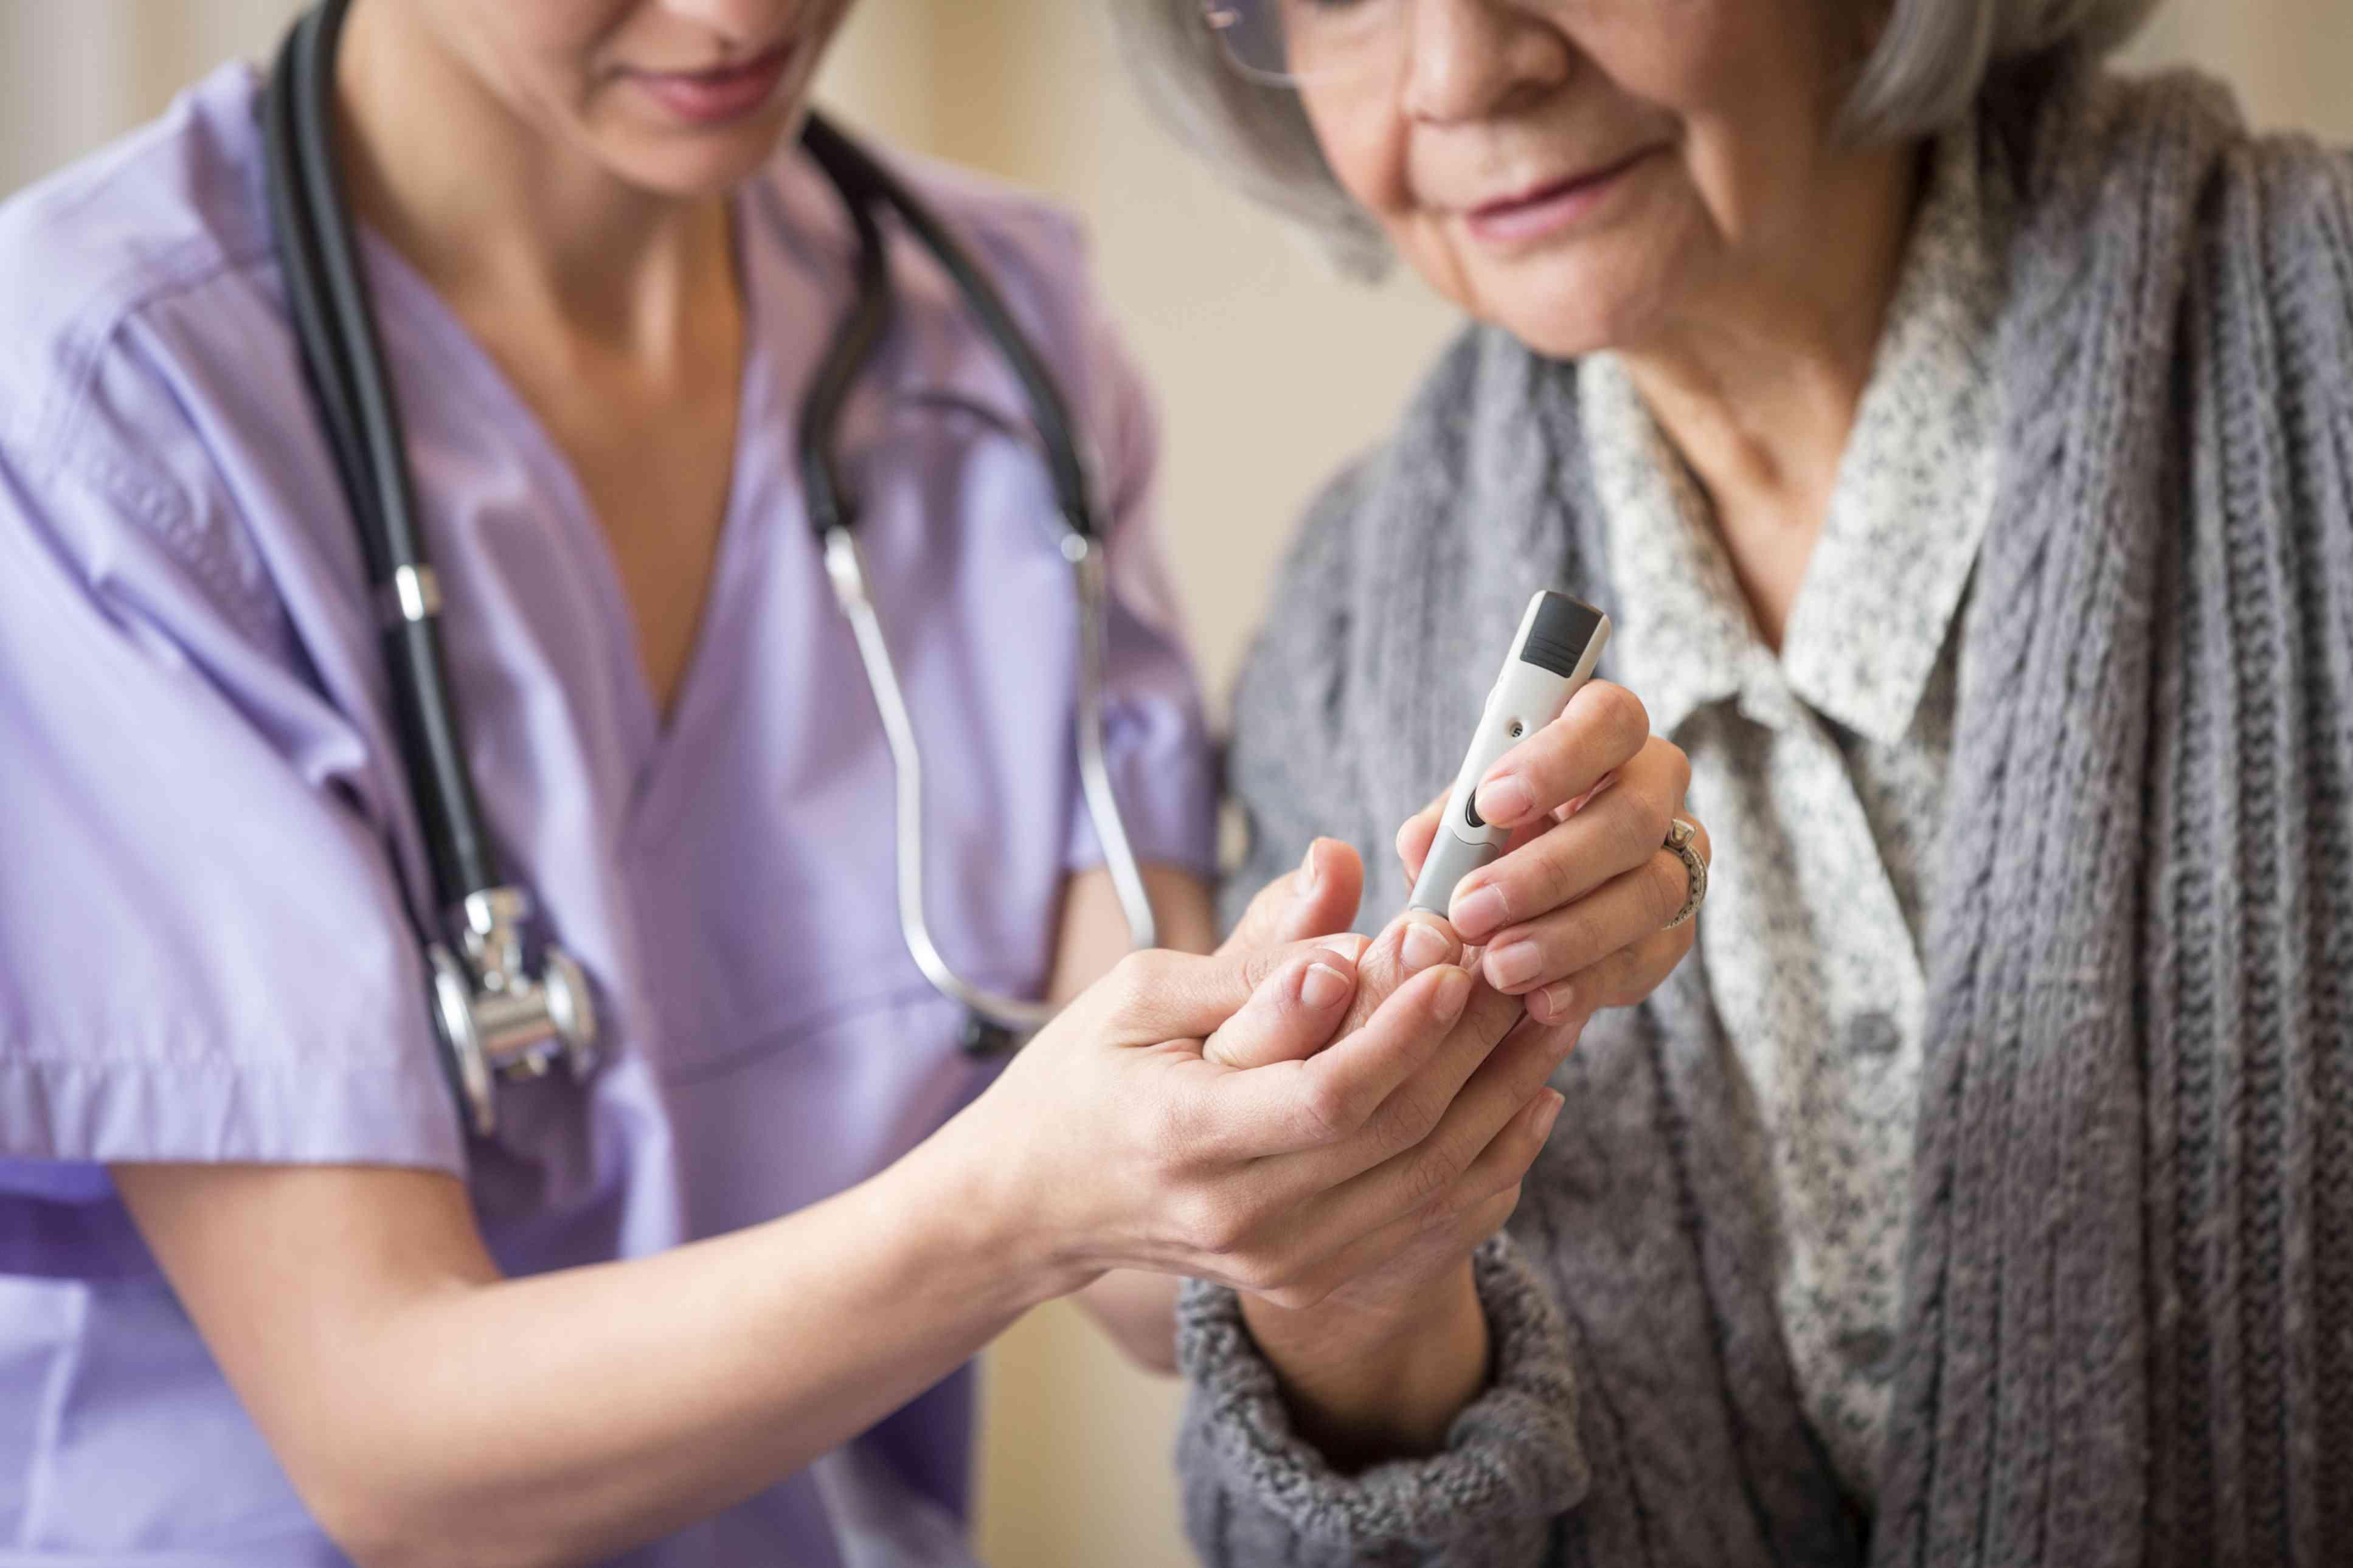 Photo of a nurse checking a woman's blood sugar